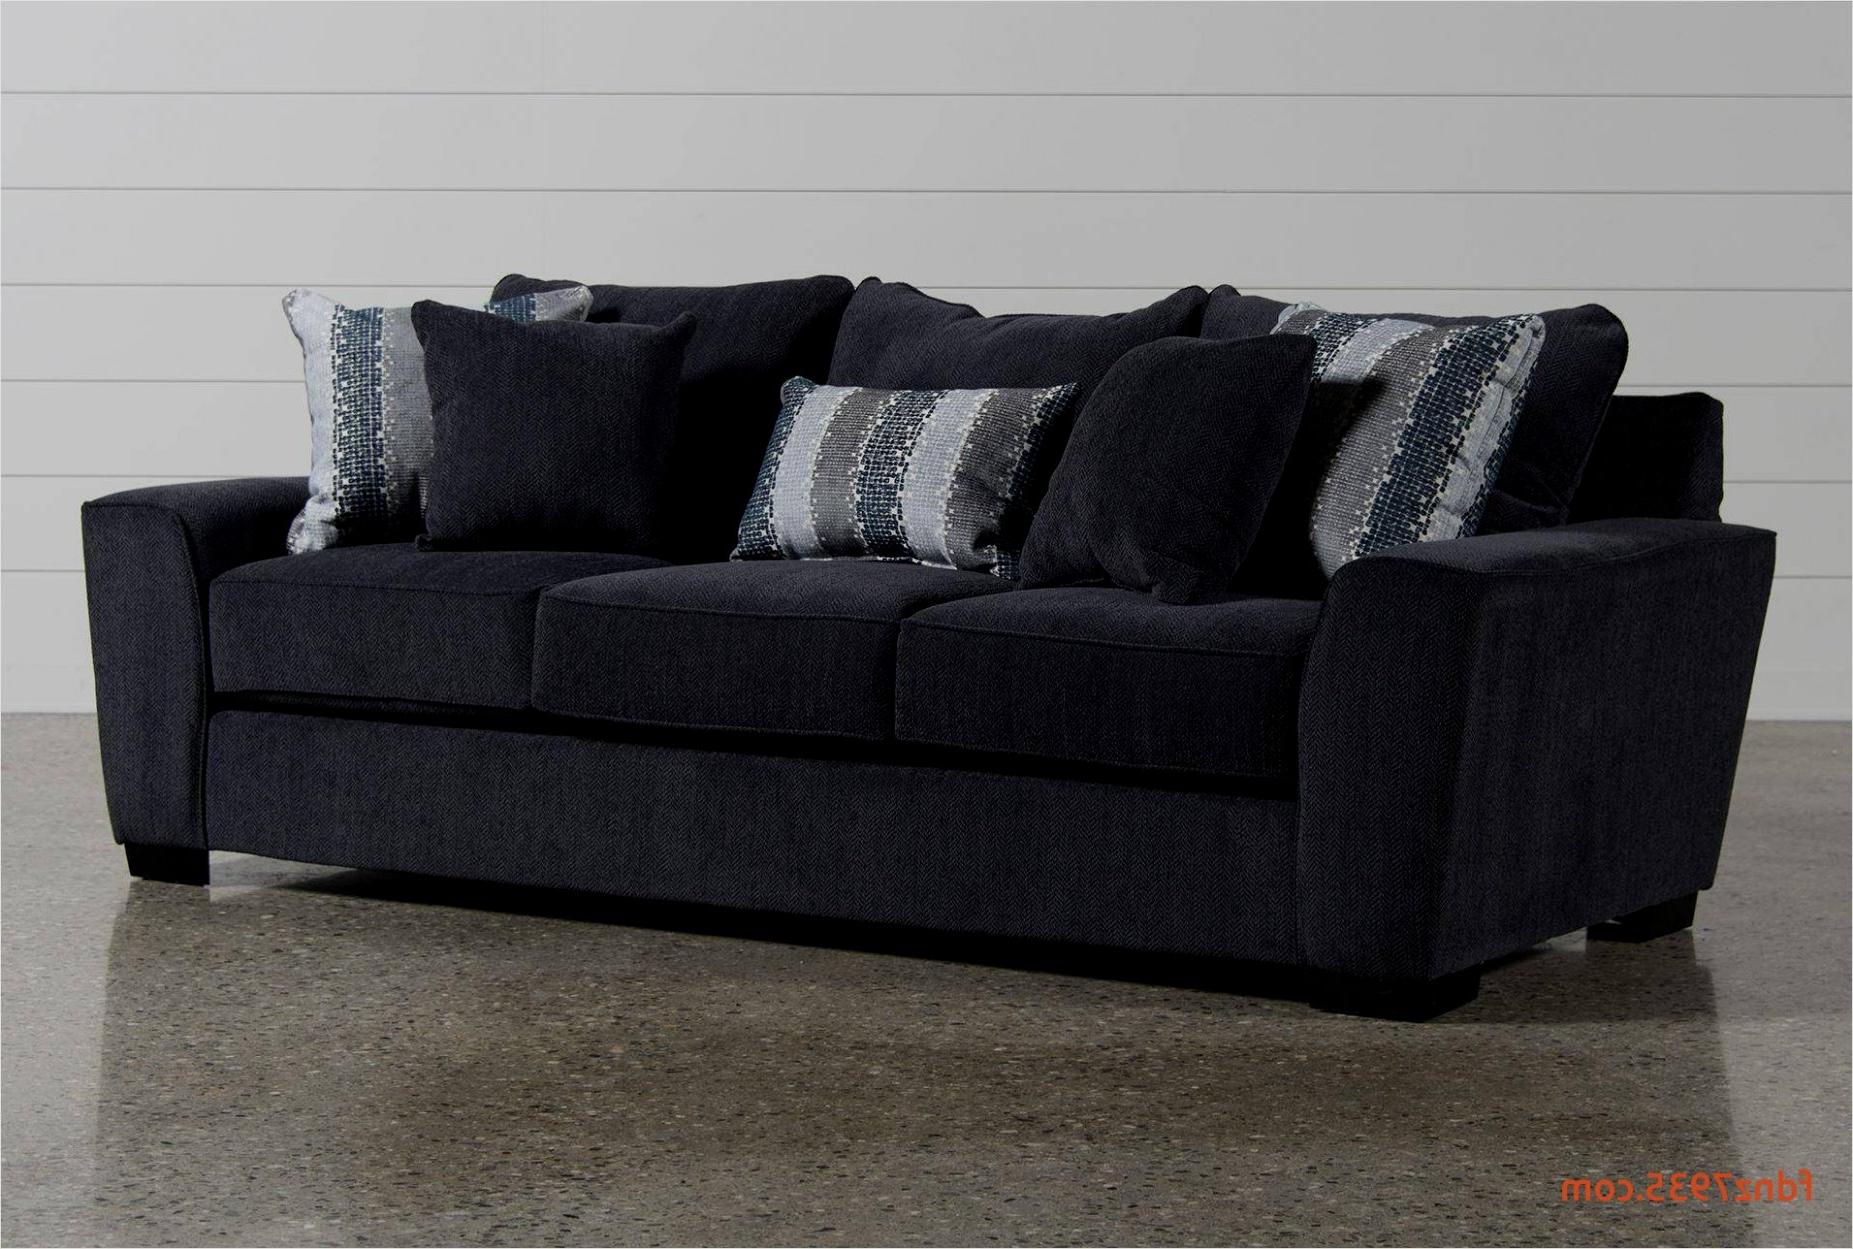 Sofas Baratos Conforama Txdf sofas Baratos Conforama Bello sofas and Loveseats Fresh sofa